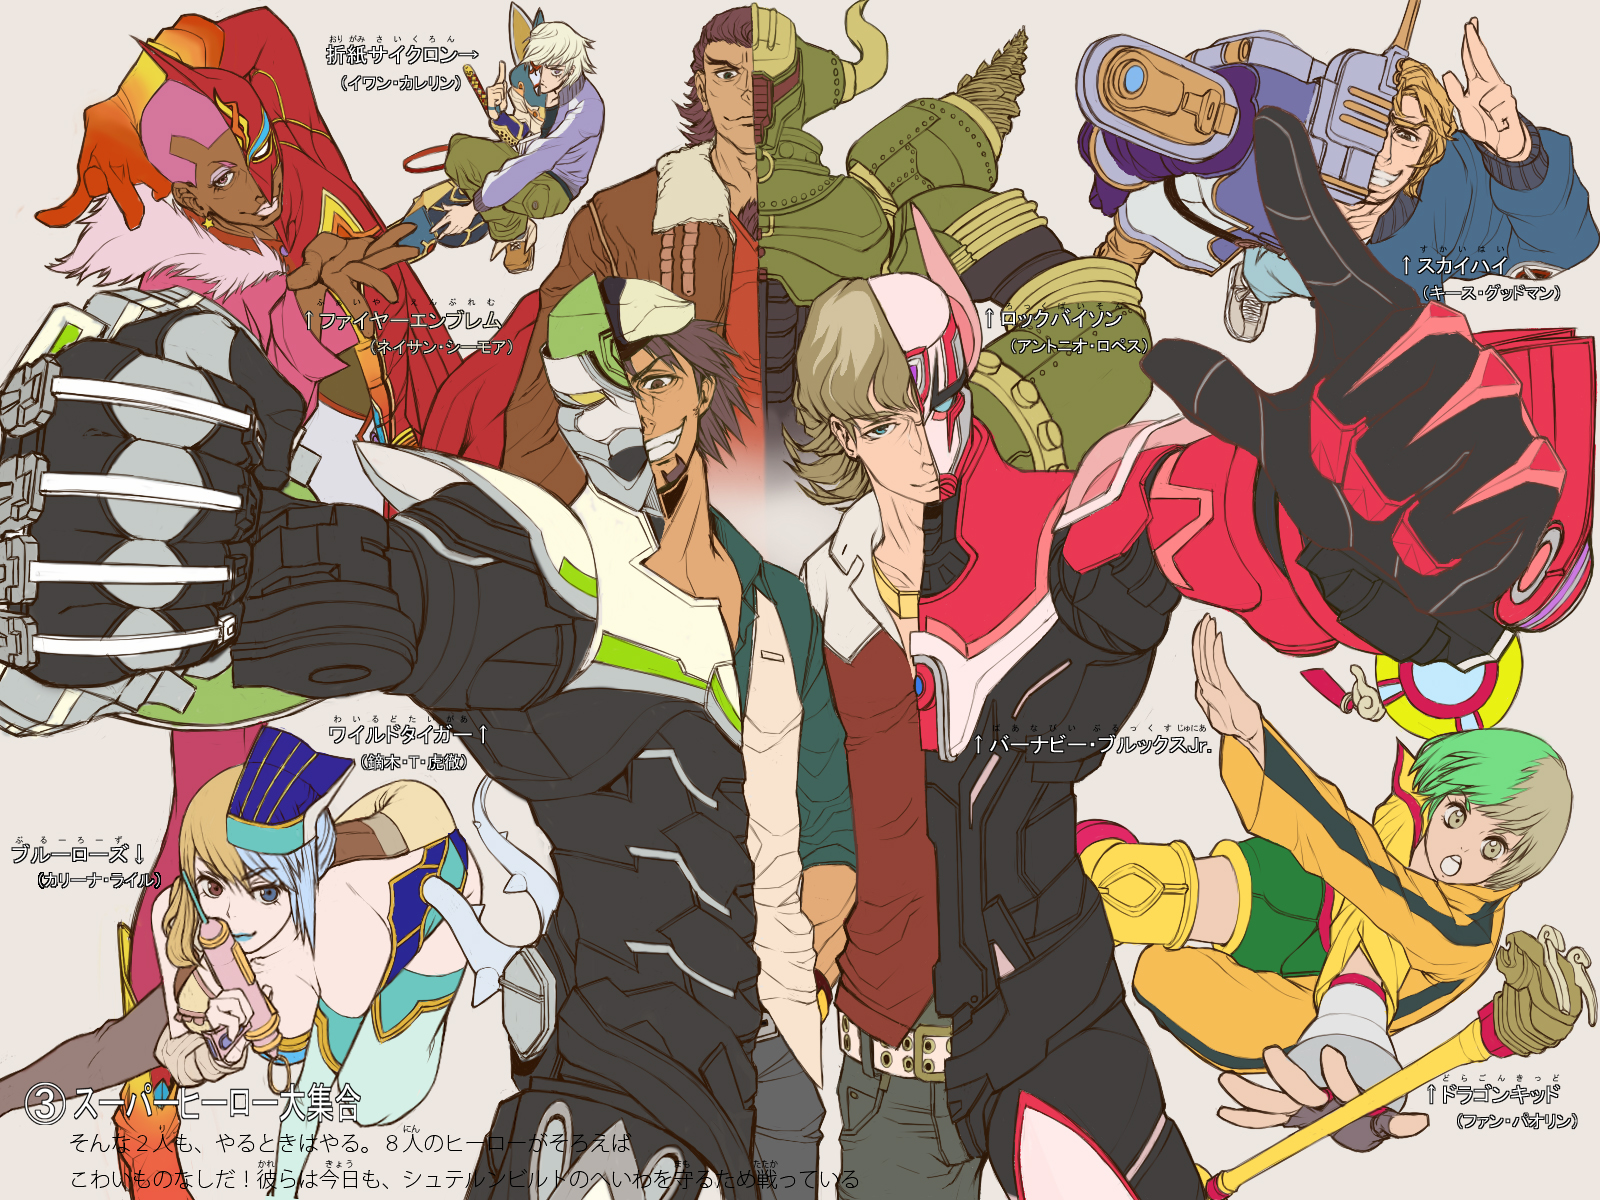 Image of Tiger and Bunny anime